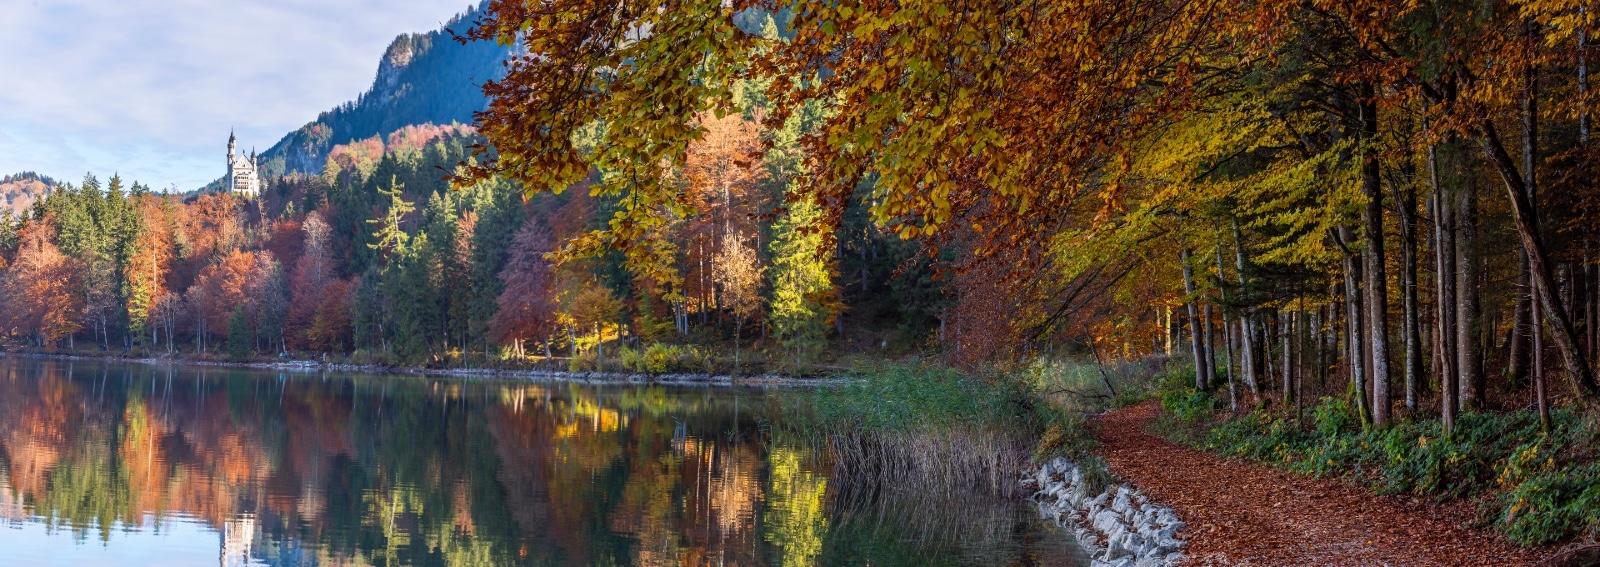 Bavarian Foresta edreams